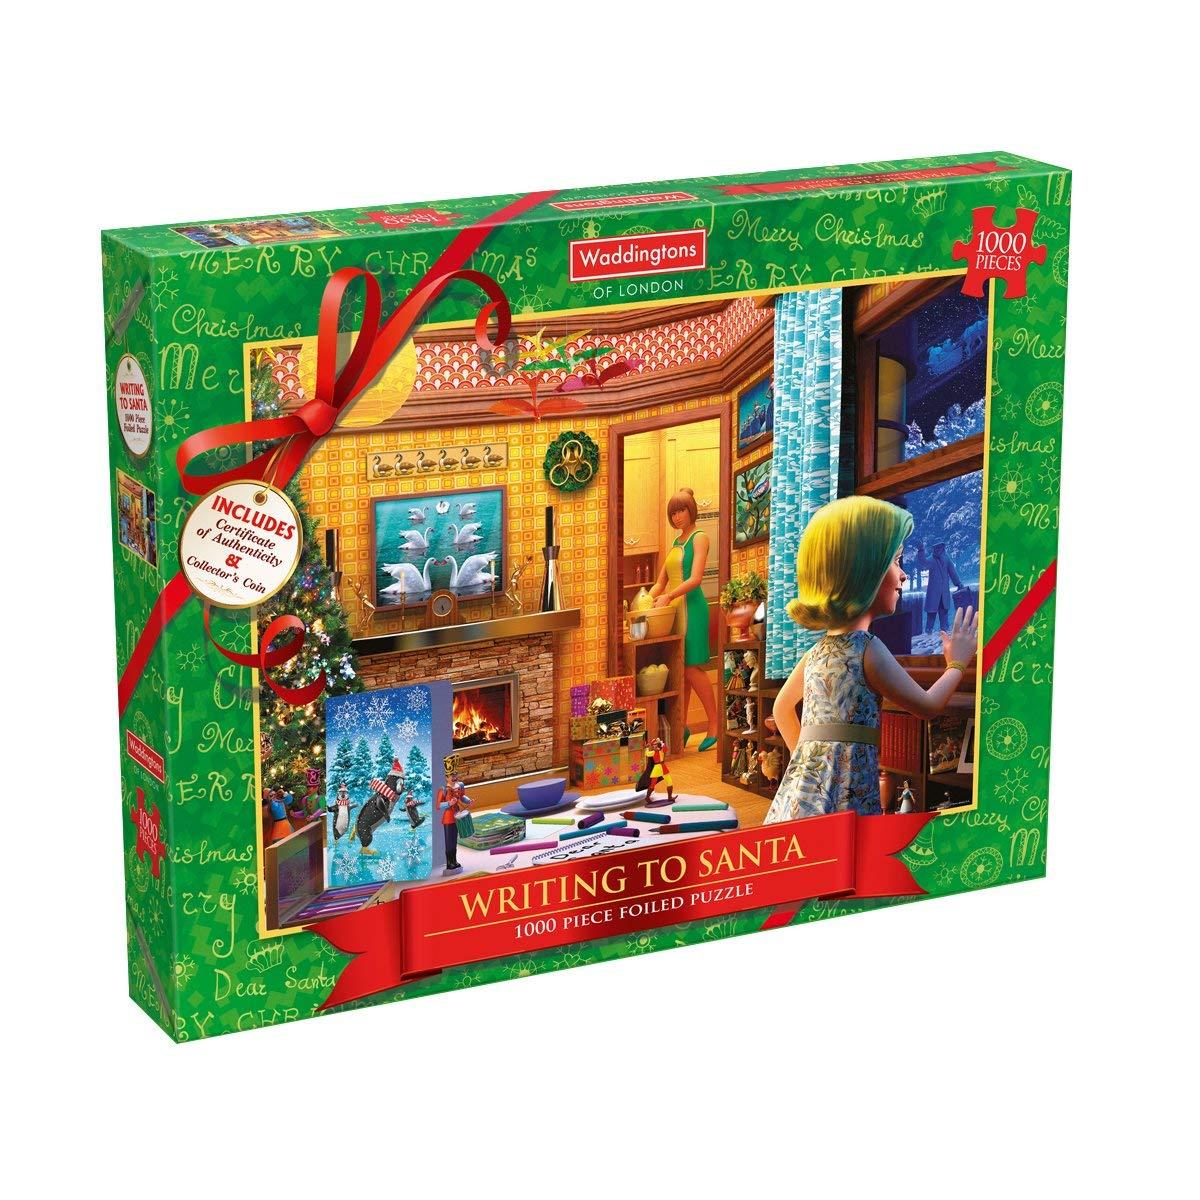 Christmas 1000 Piece Jigsaw Puzzle @ Amazon Add On £4.99